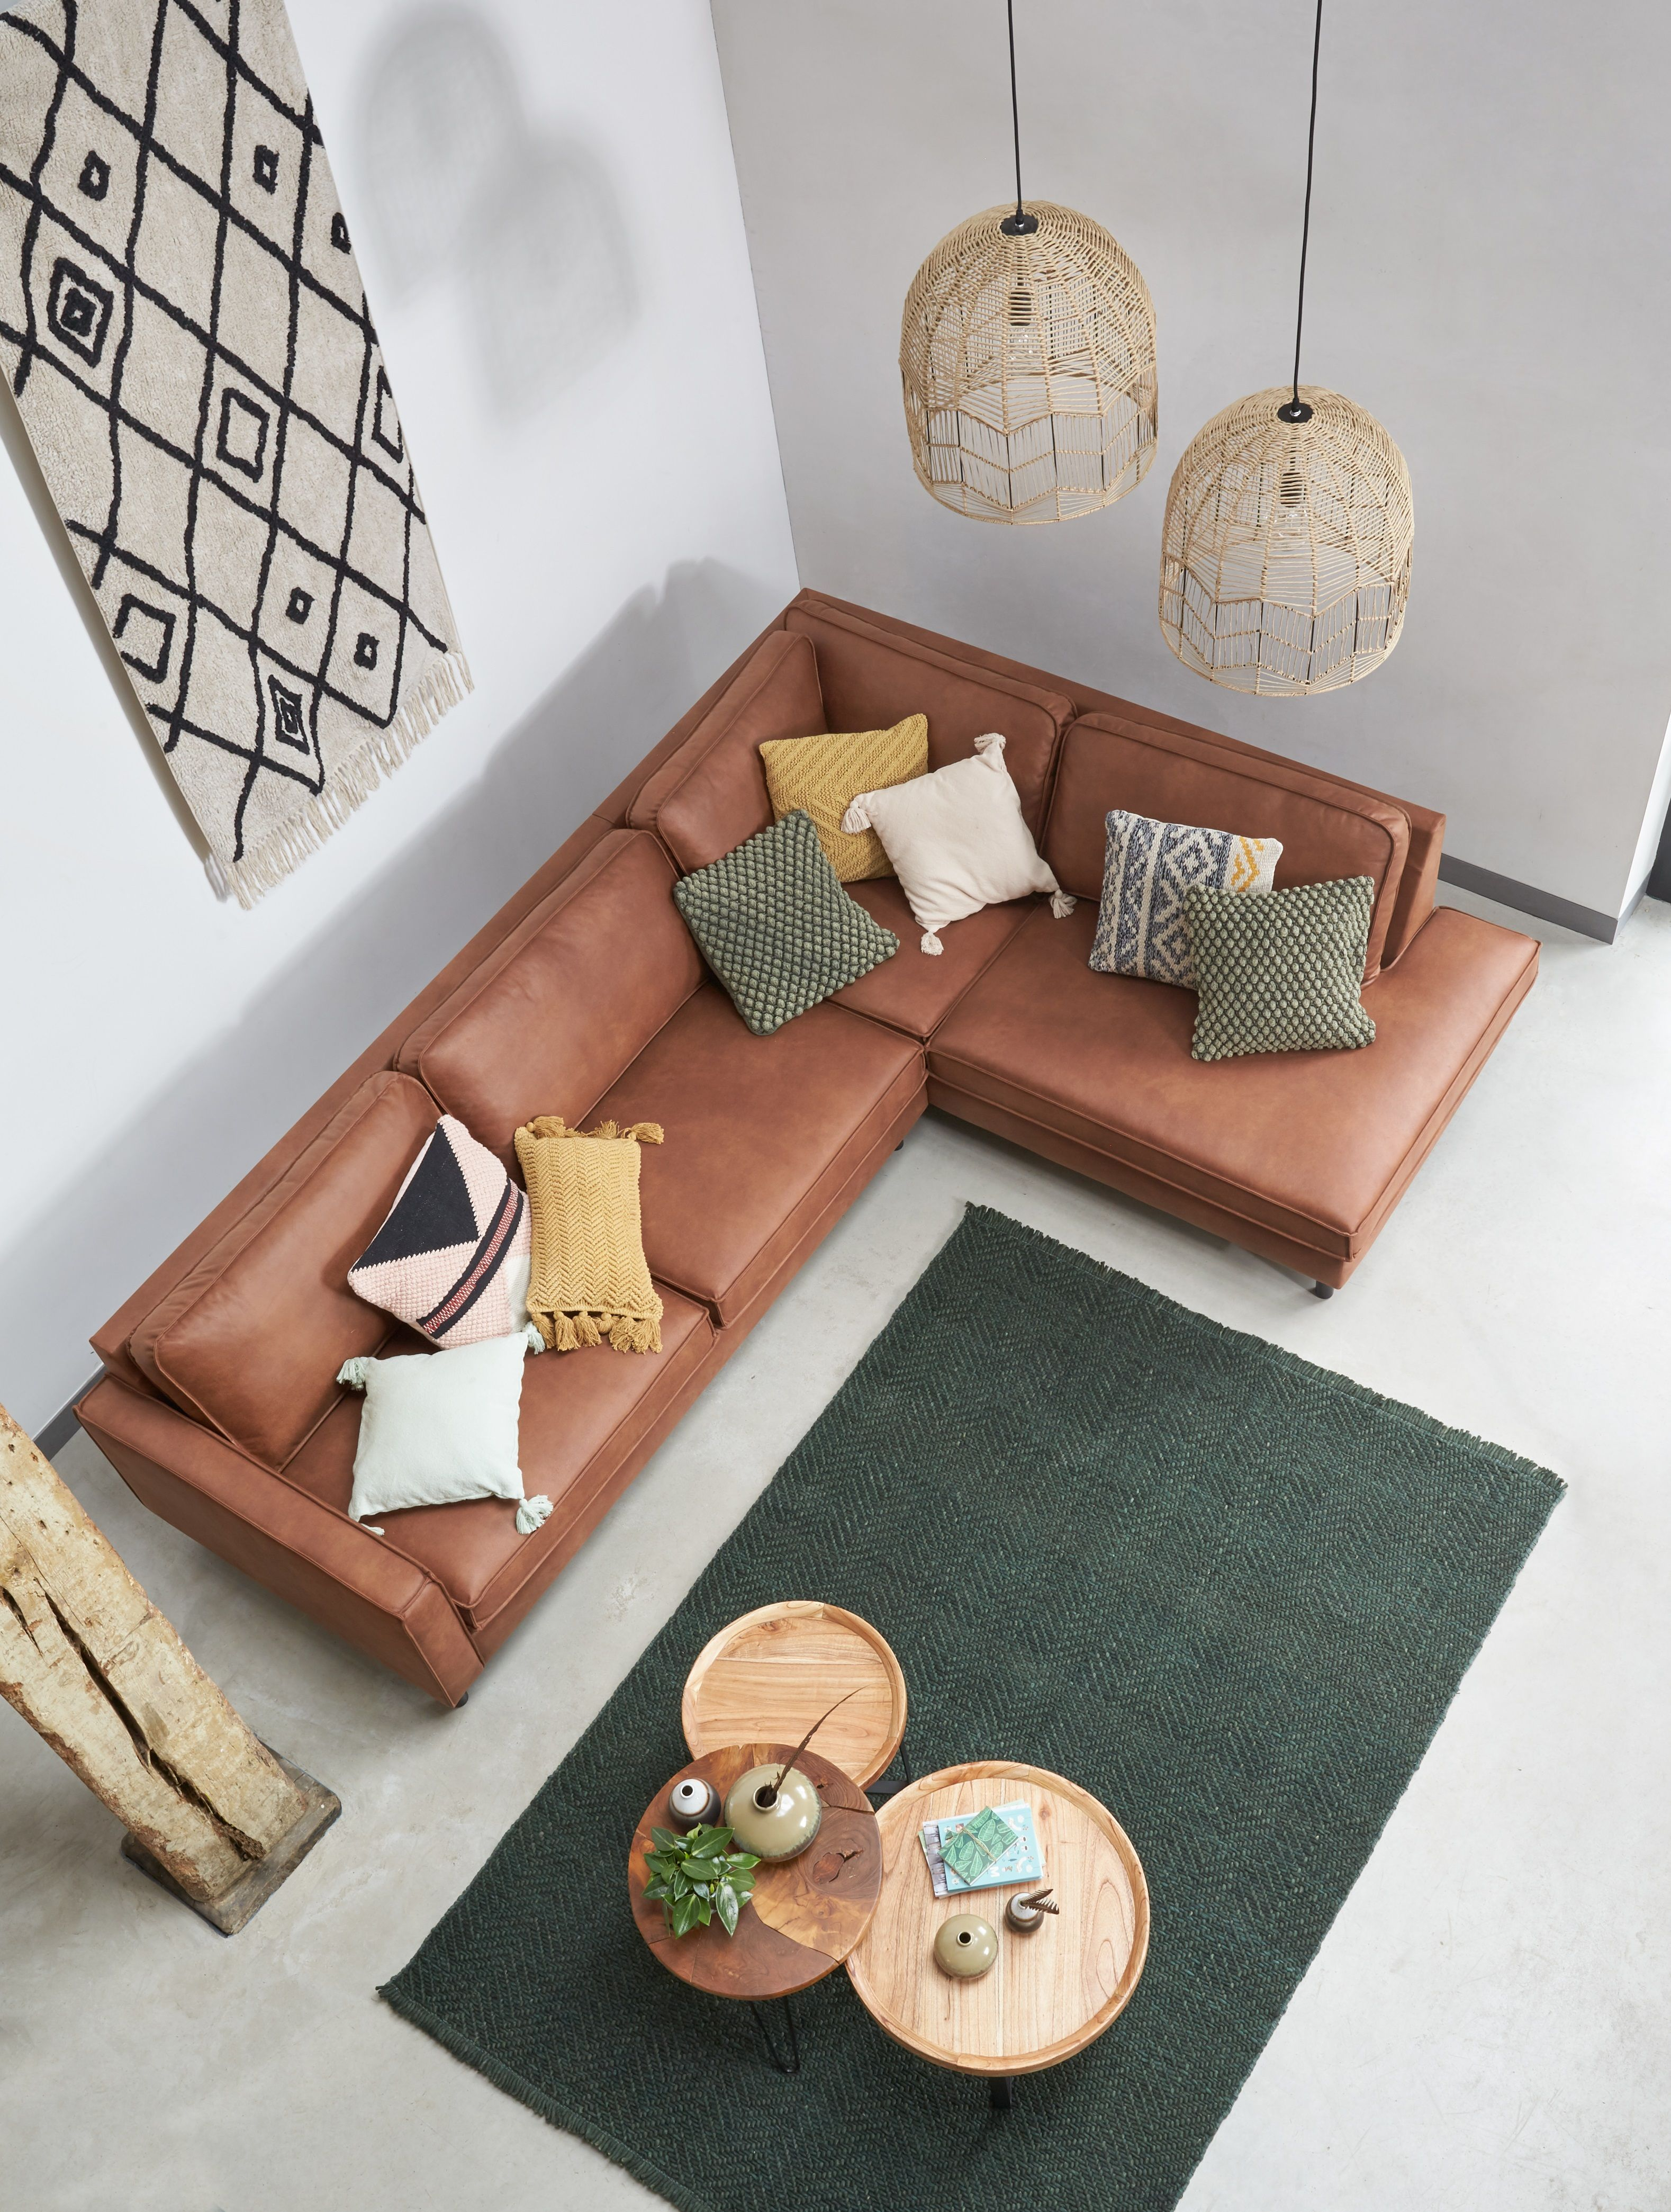 Sofa Bed Kwantum.Hoekbank Pinto Lichtbruin Links Kwantum In 2019 Idea Furniture